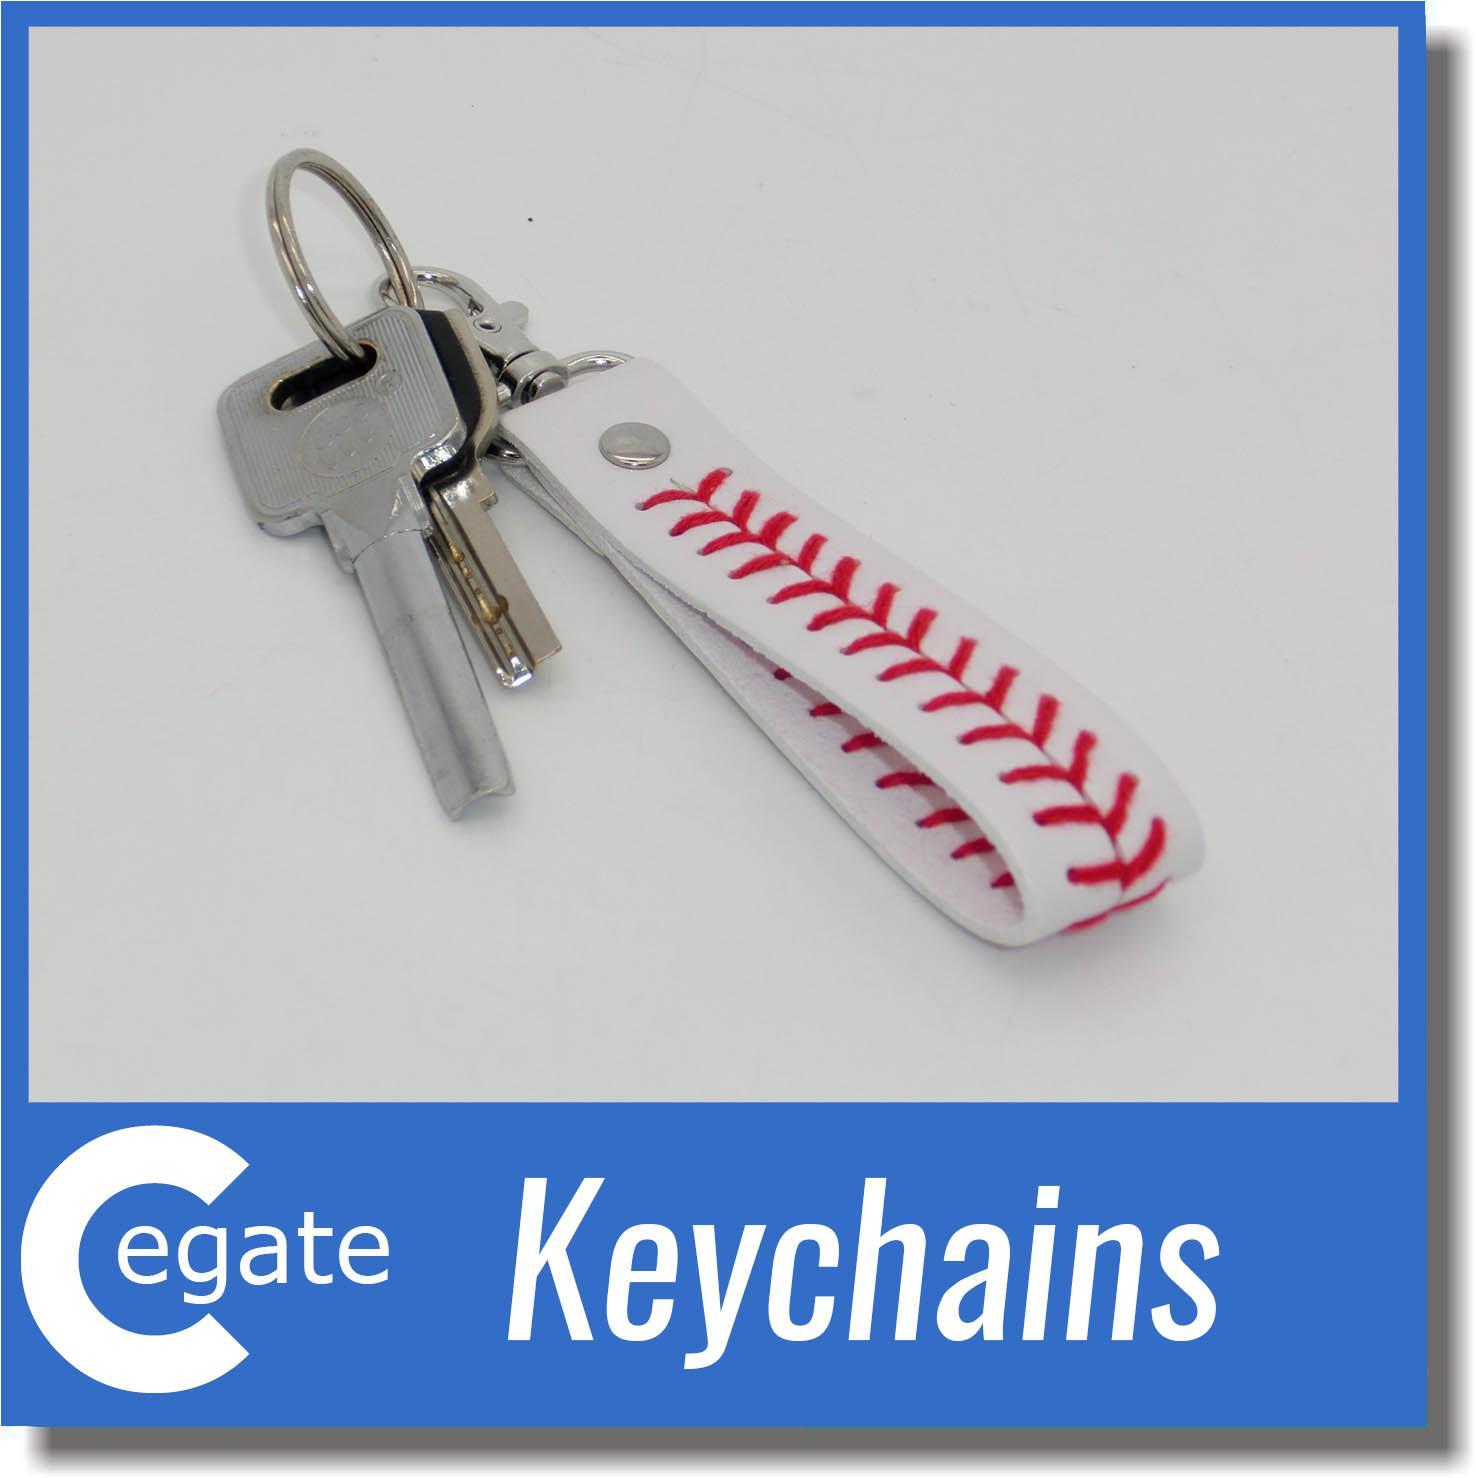 2016 factory is cheap baseball keychain,fastpitch softball accessories baseball seam keychains